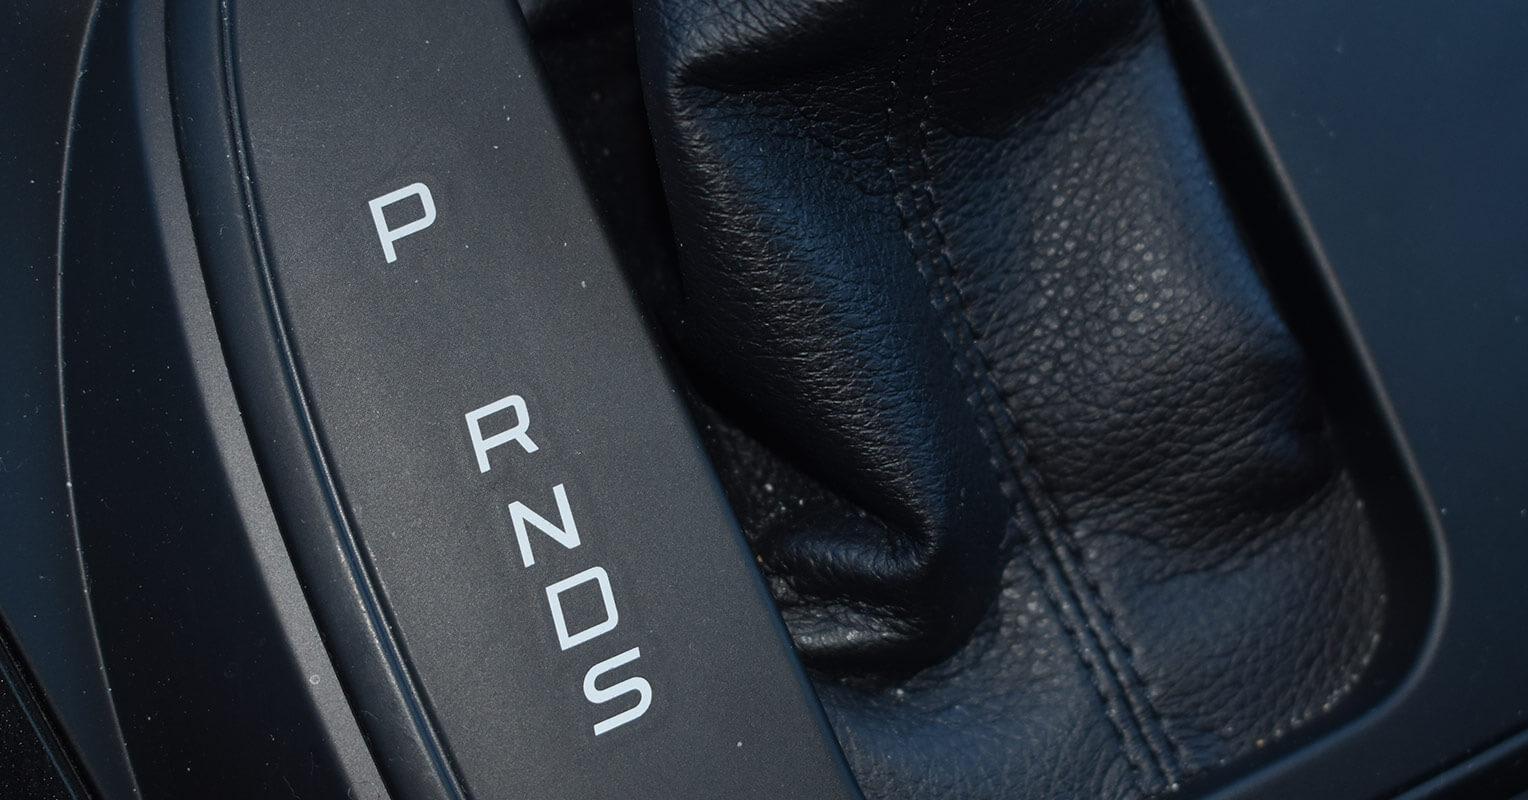 Cambio de marchas del Ford Kuga 2018